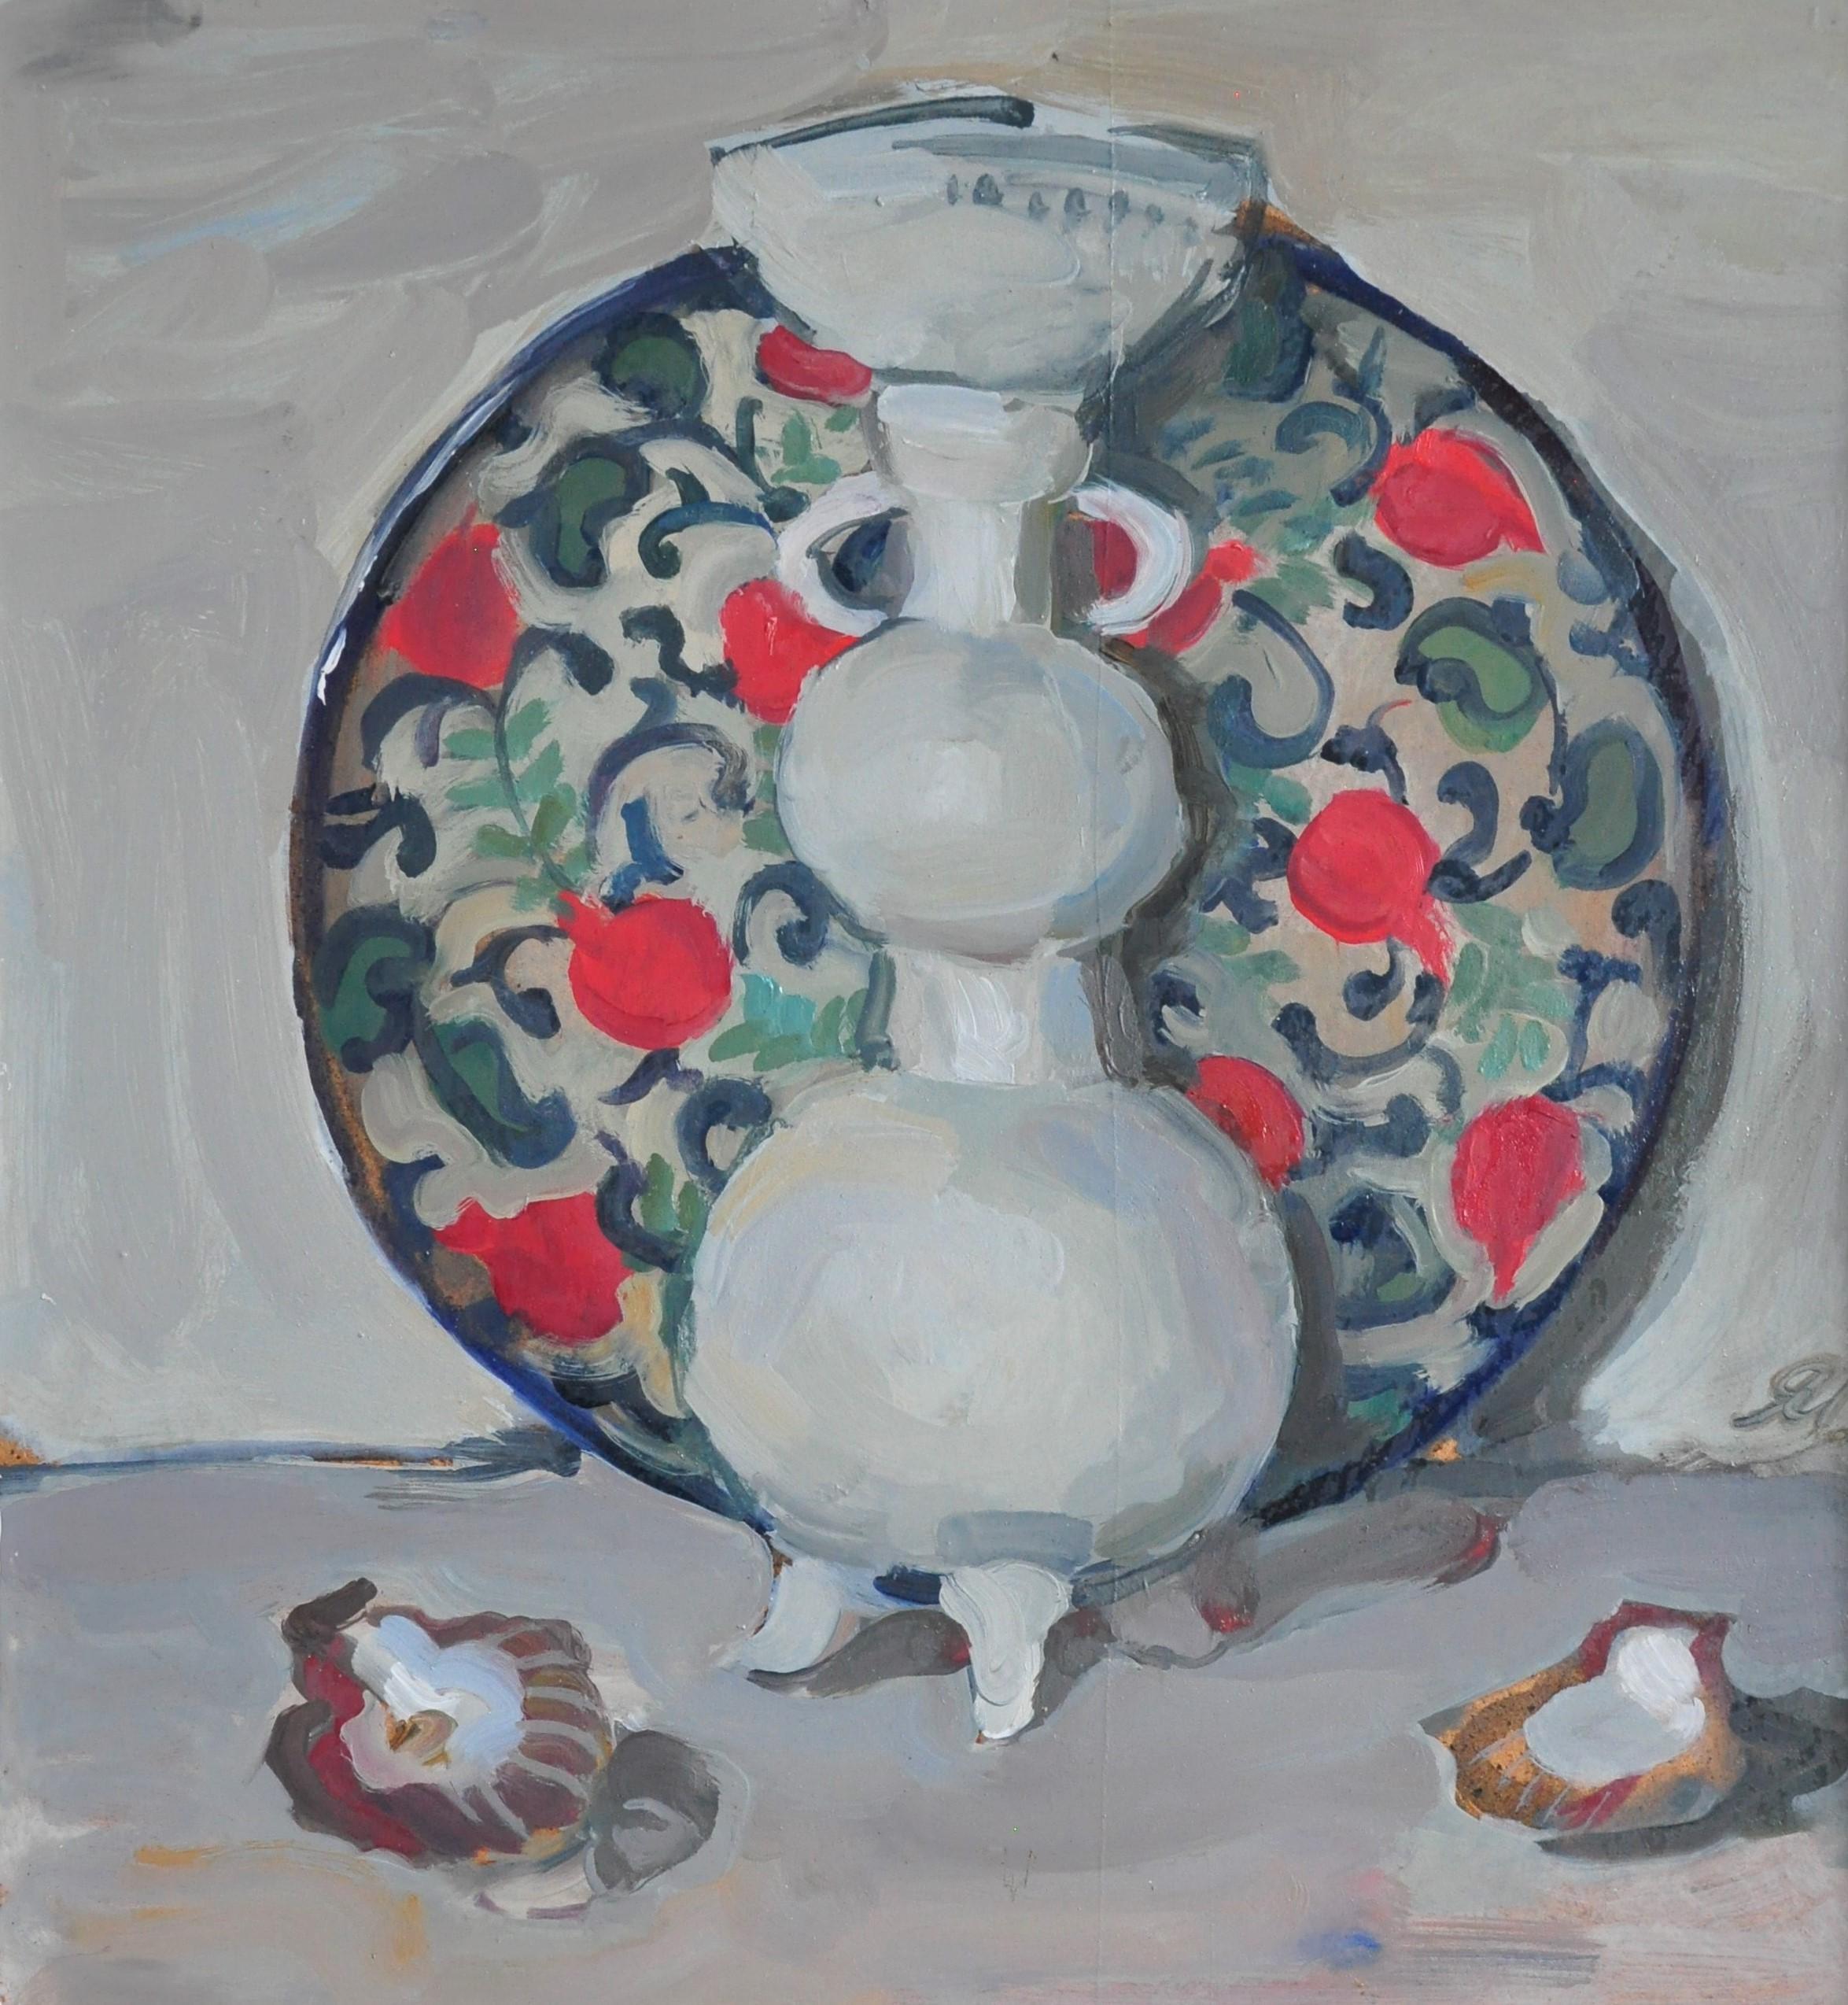 Vase and Dish With Pomegranate - Yaroslava Tichshenko 21st Century Oil Painting